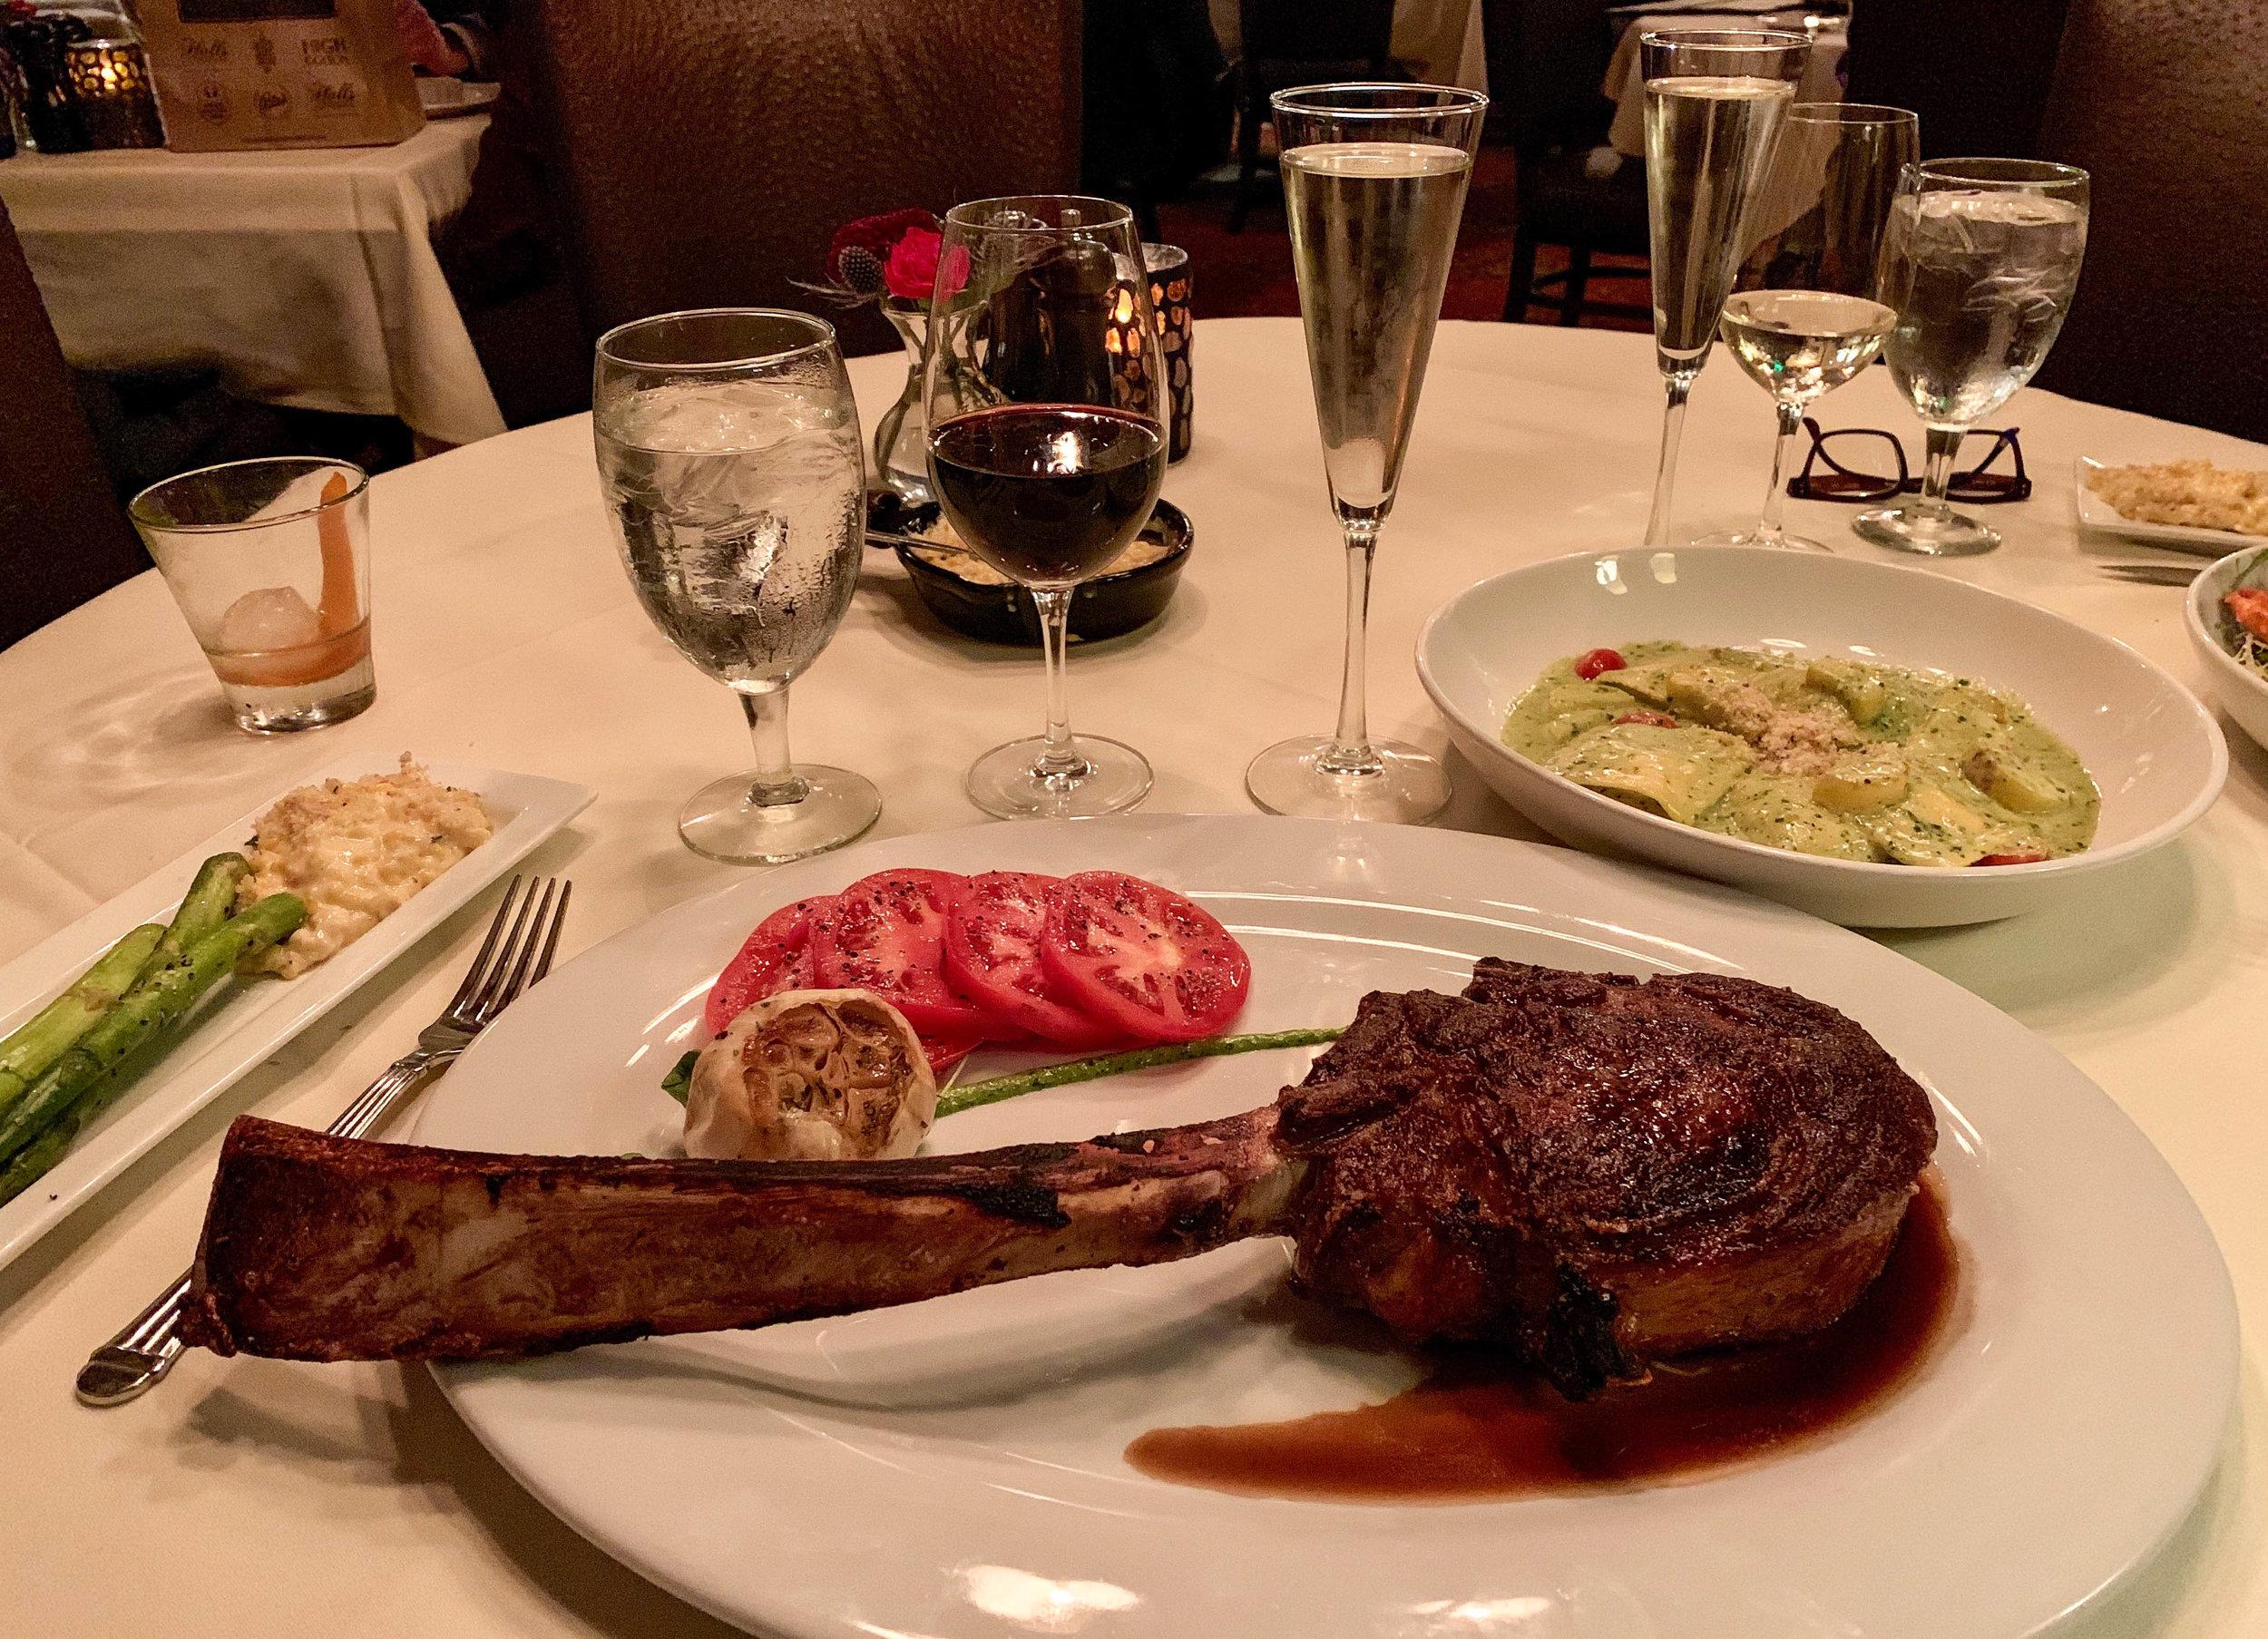 Tomahawk Steak at Halls Chophouse